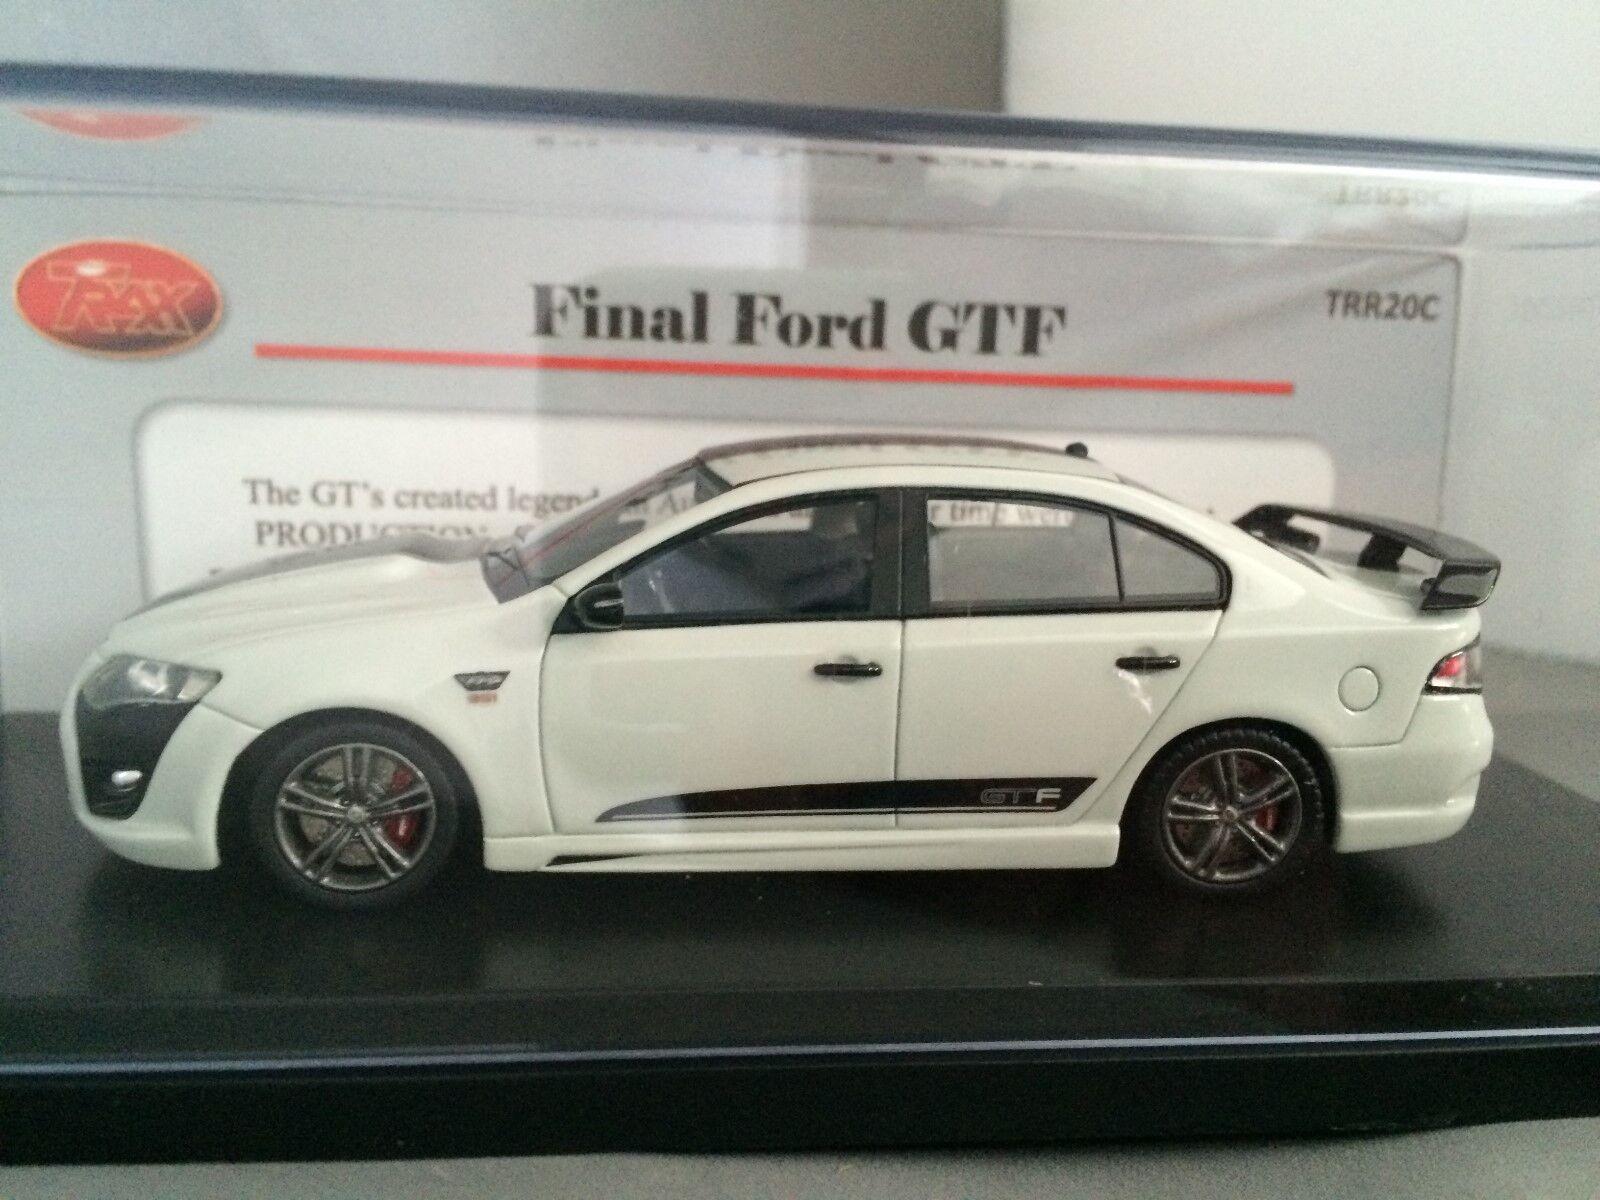 Trax TRR20C Final Ford GTF  - blanc  vente d'usine en ligne discount